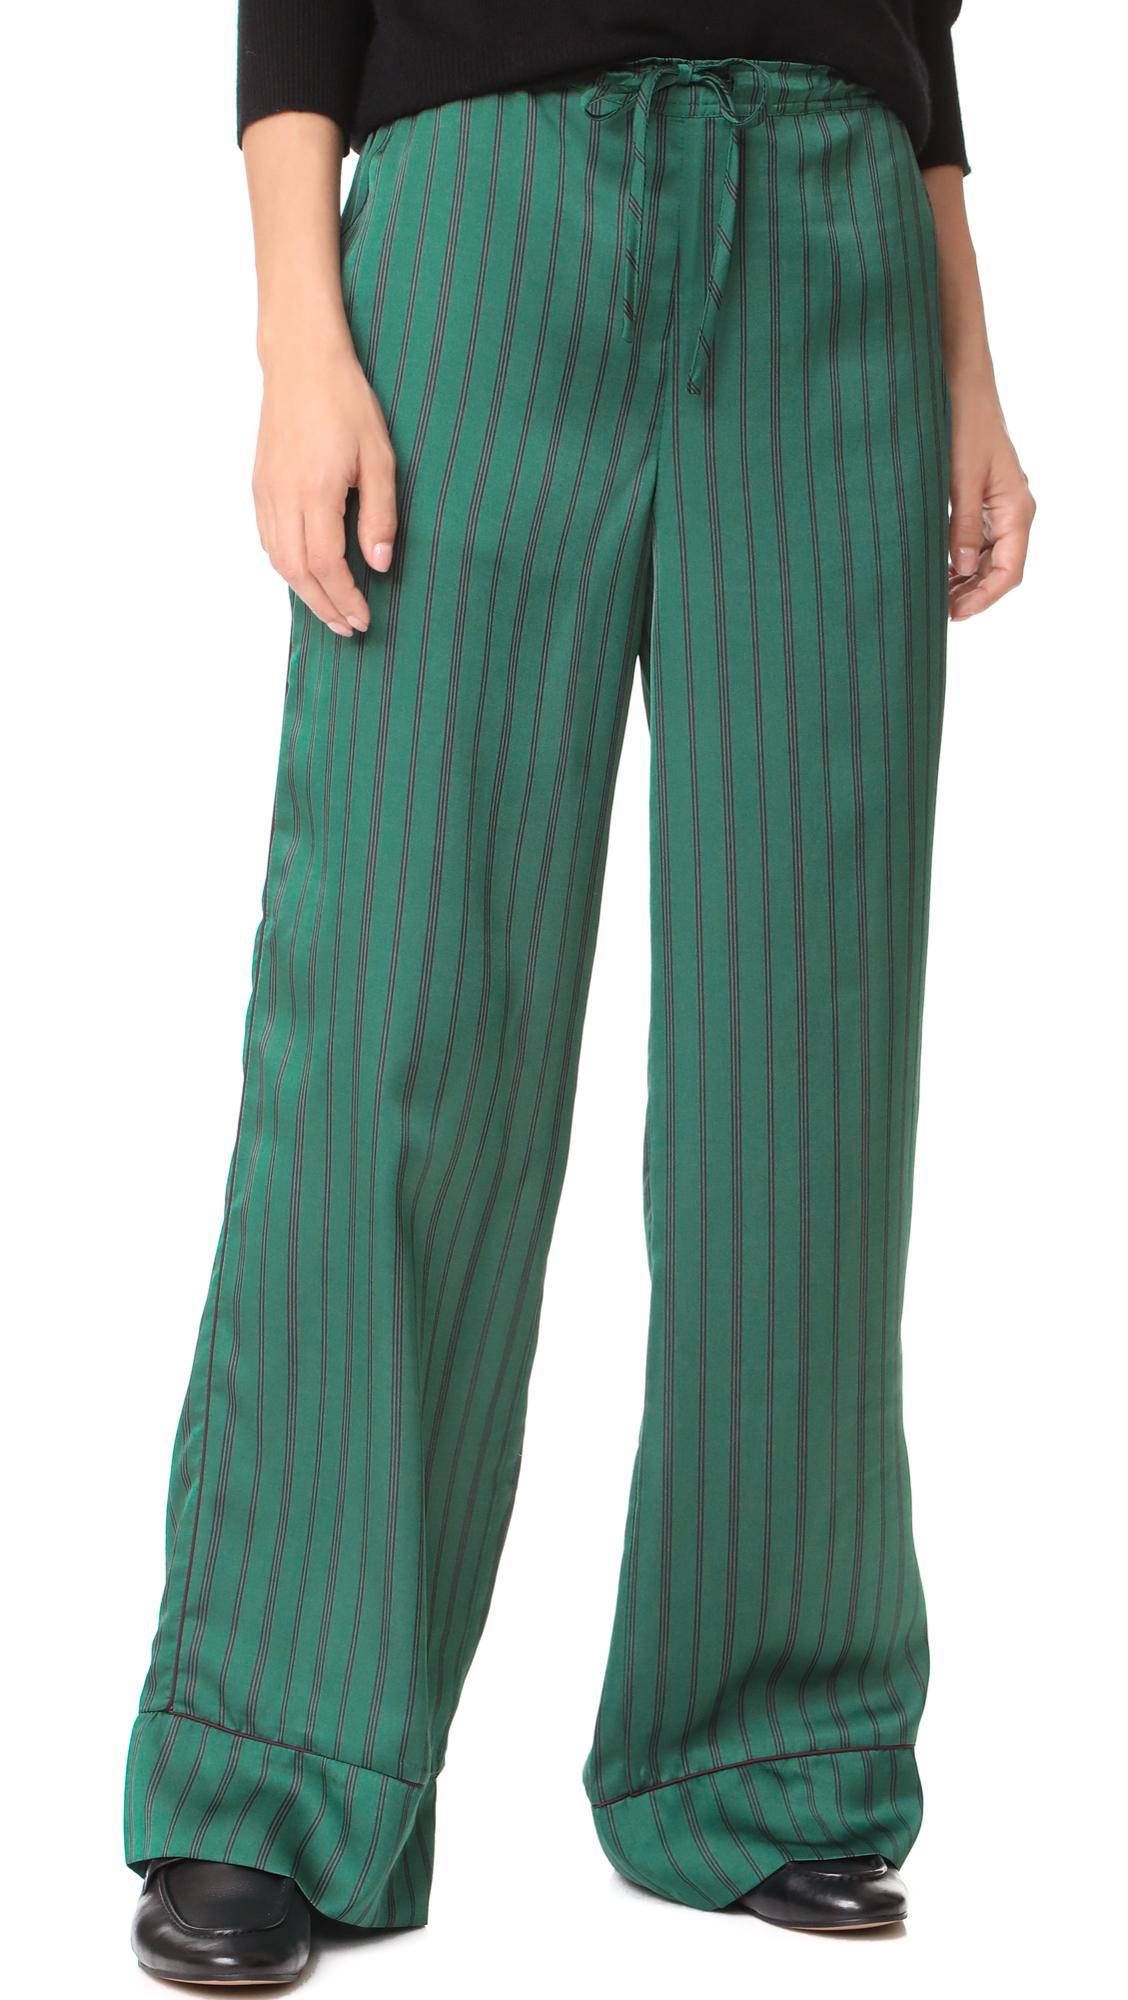 Scotch & Soda/Maison Scotch Wide Leg Pajama Pants - Combo S